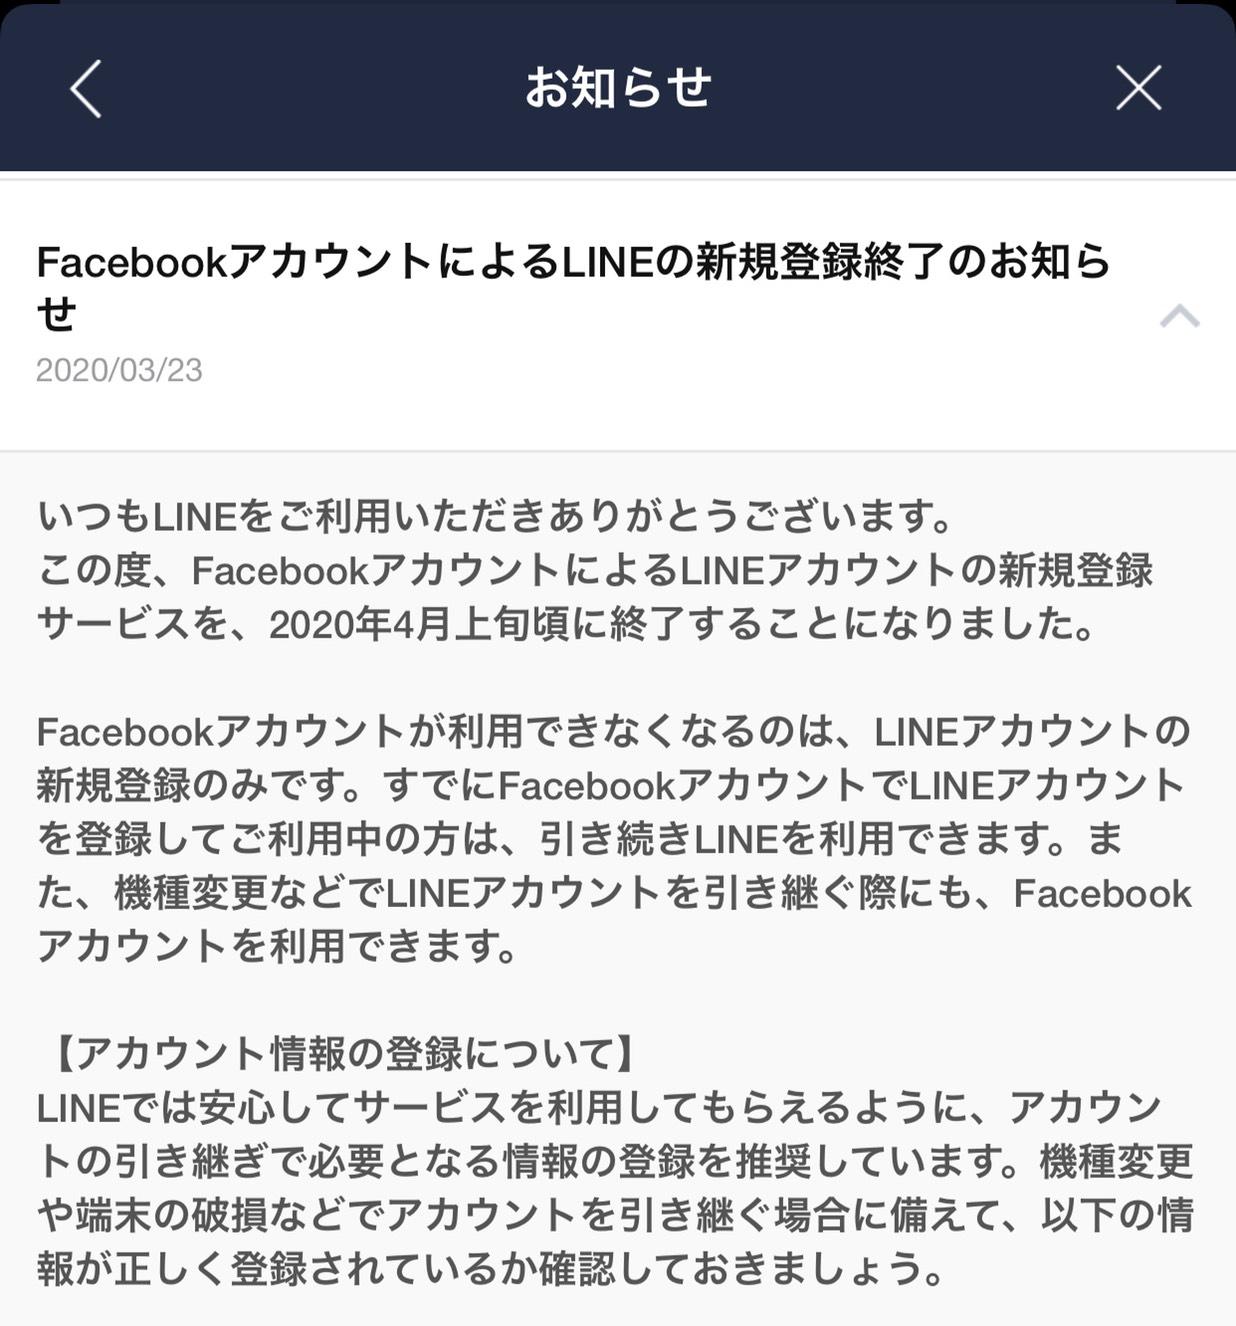 Facebookログイン終了